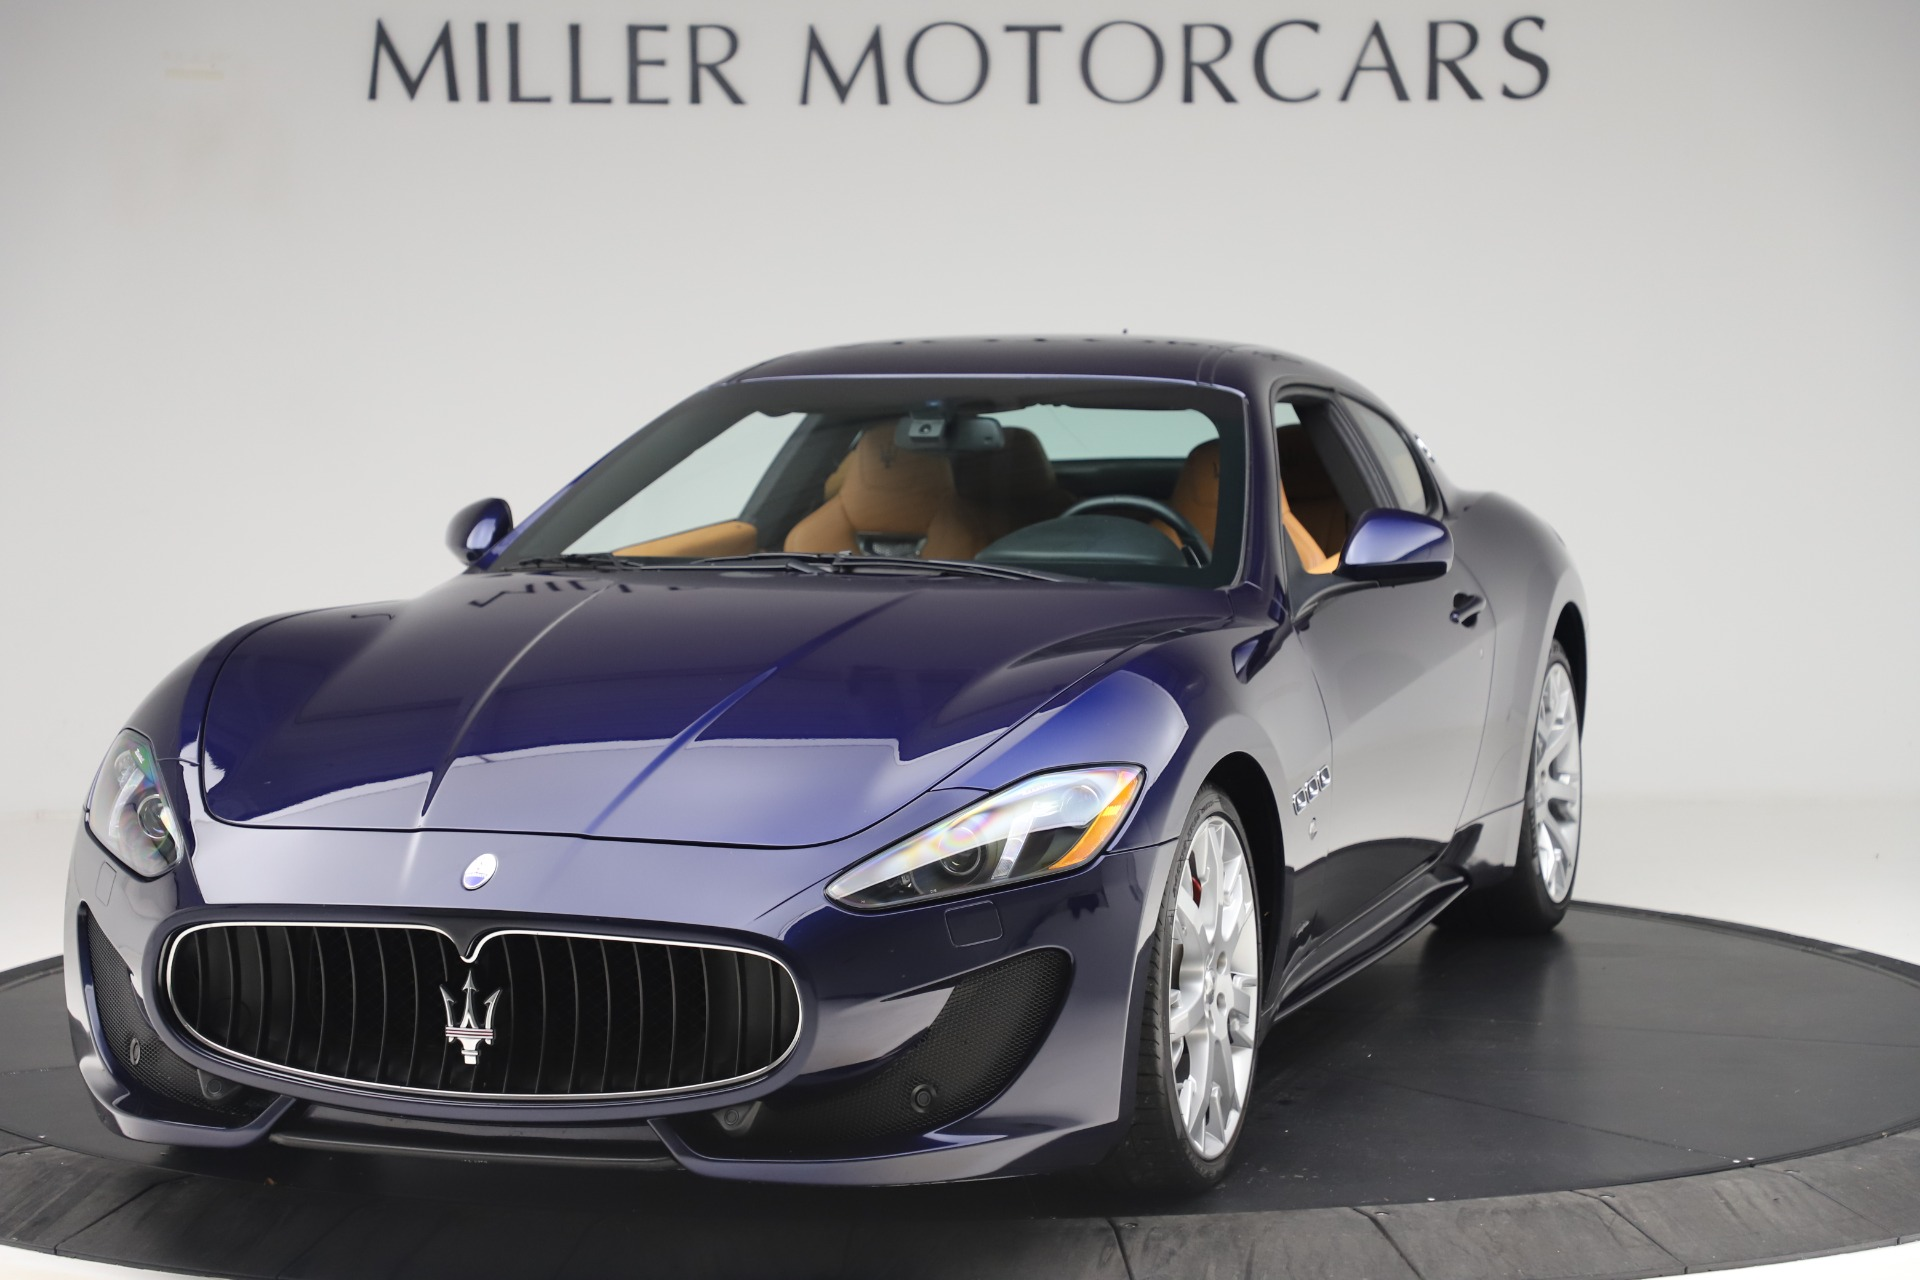 Used 2016 Maserati GranTurismo Sport for sale Sold at Pagani of Greenwich in Greenwich CT 06830 1